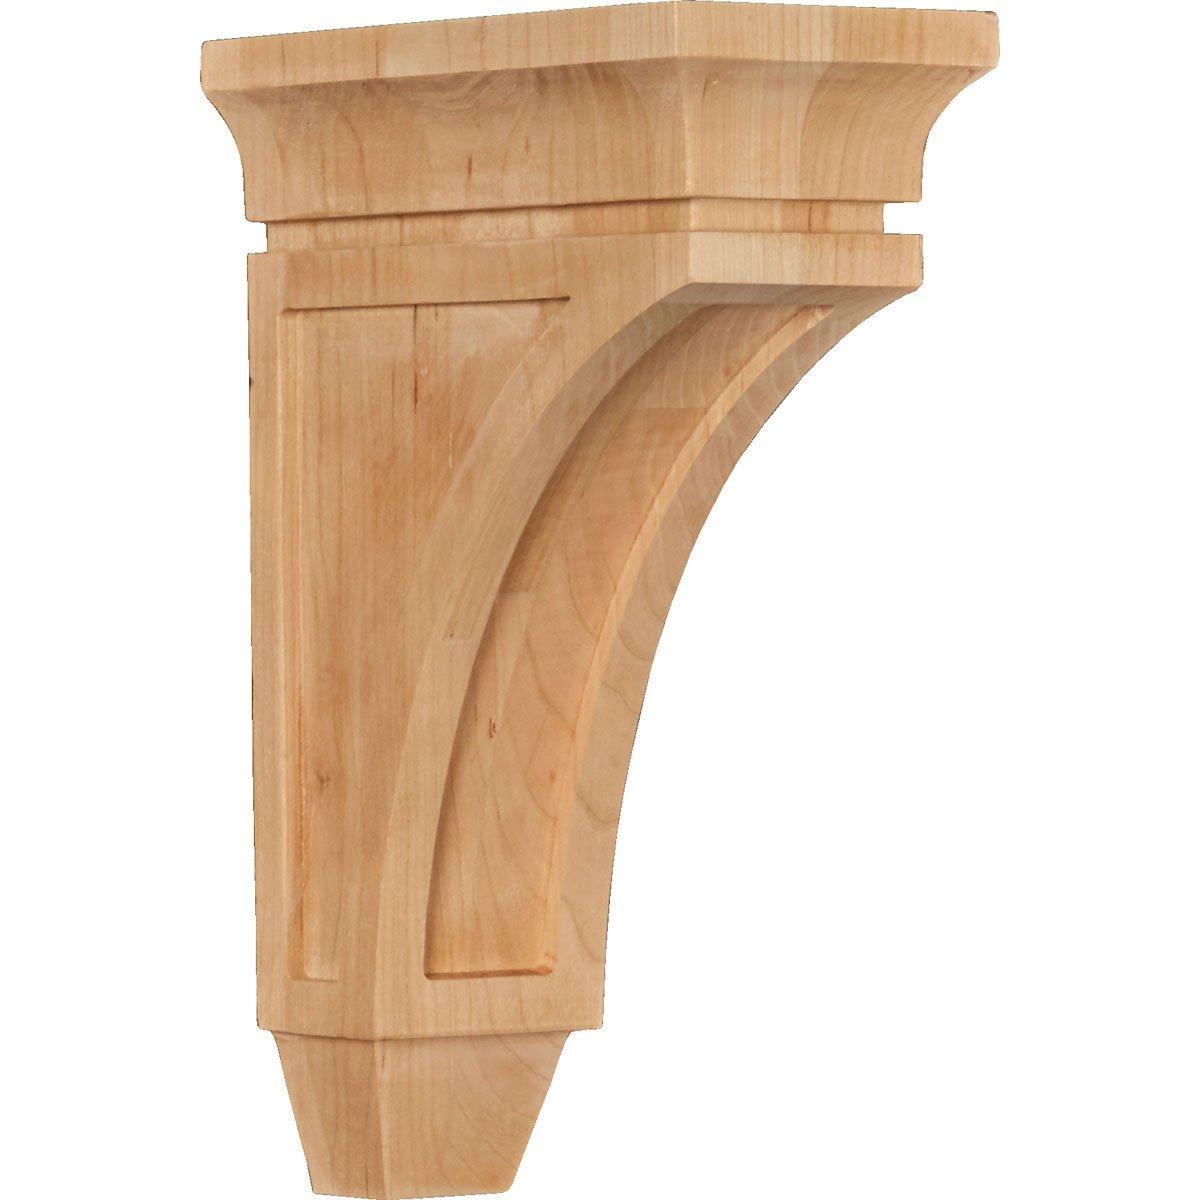 Maple 3 3//8W x 6 3//4D x 10H Ekena Millwork CORW03X07X10LUMA Wood Corbel